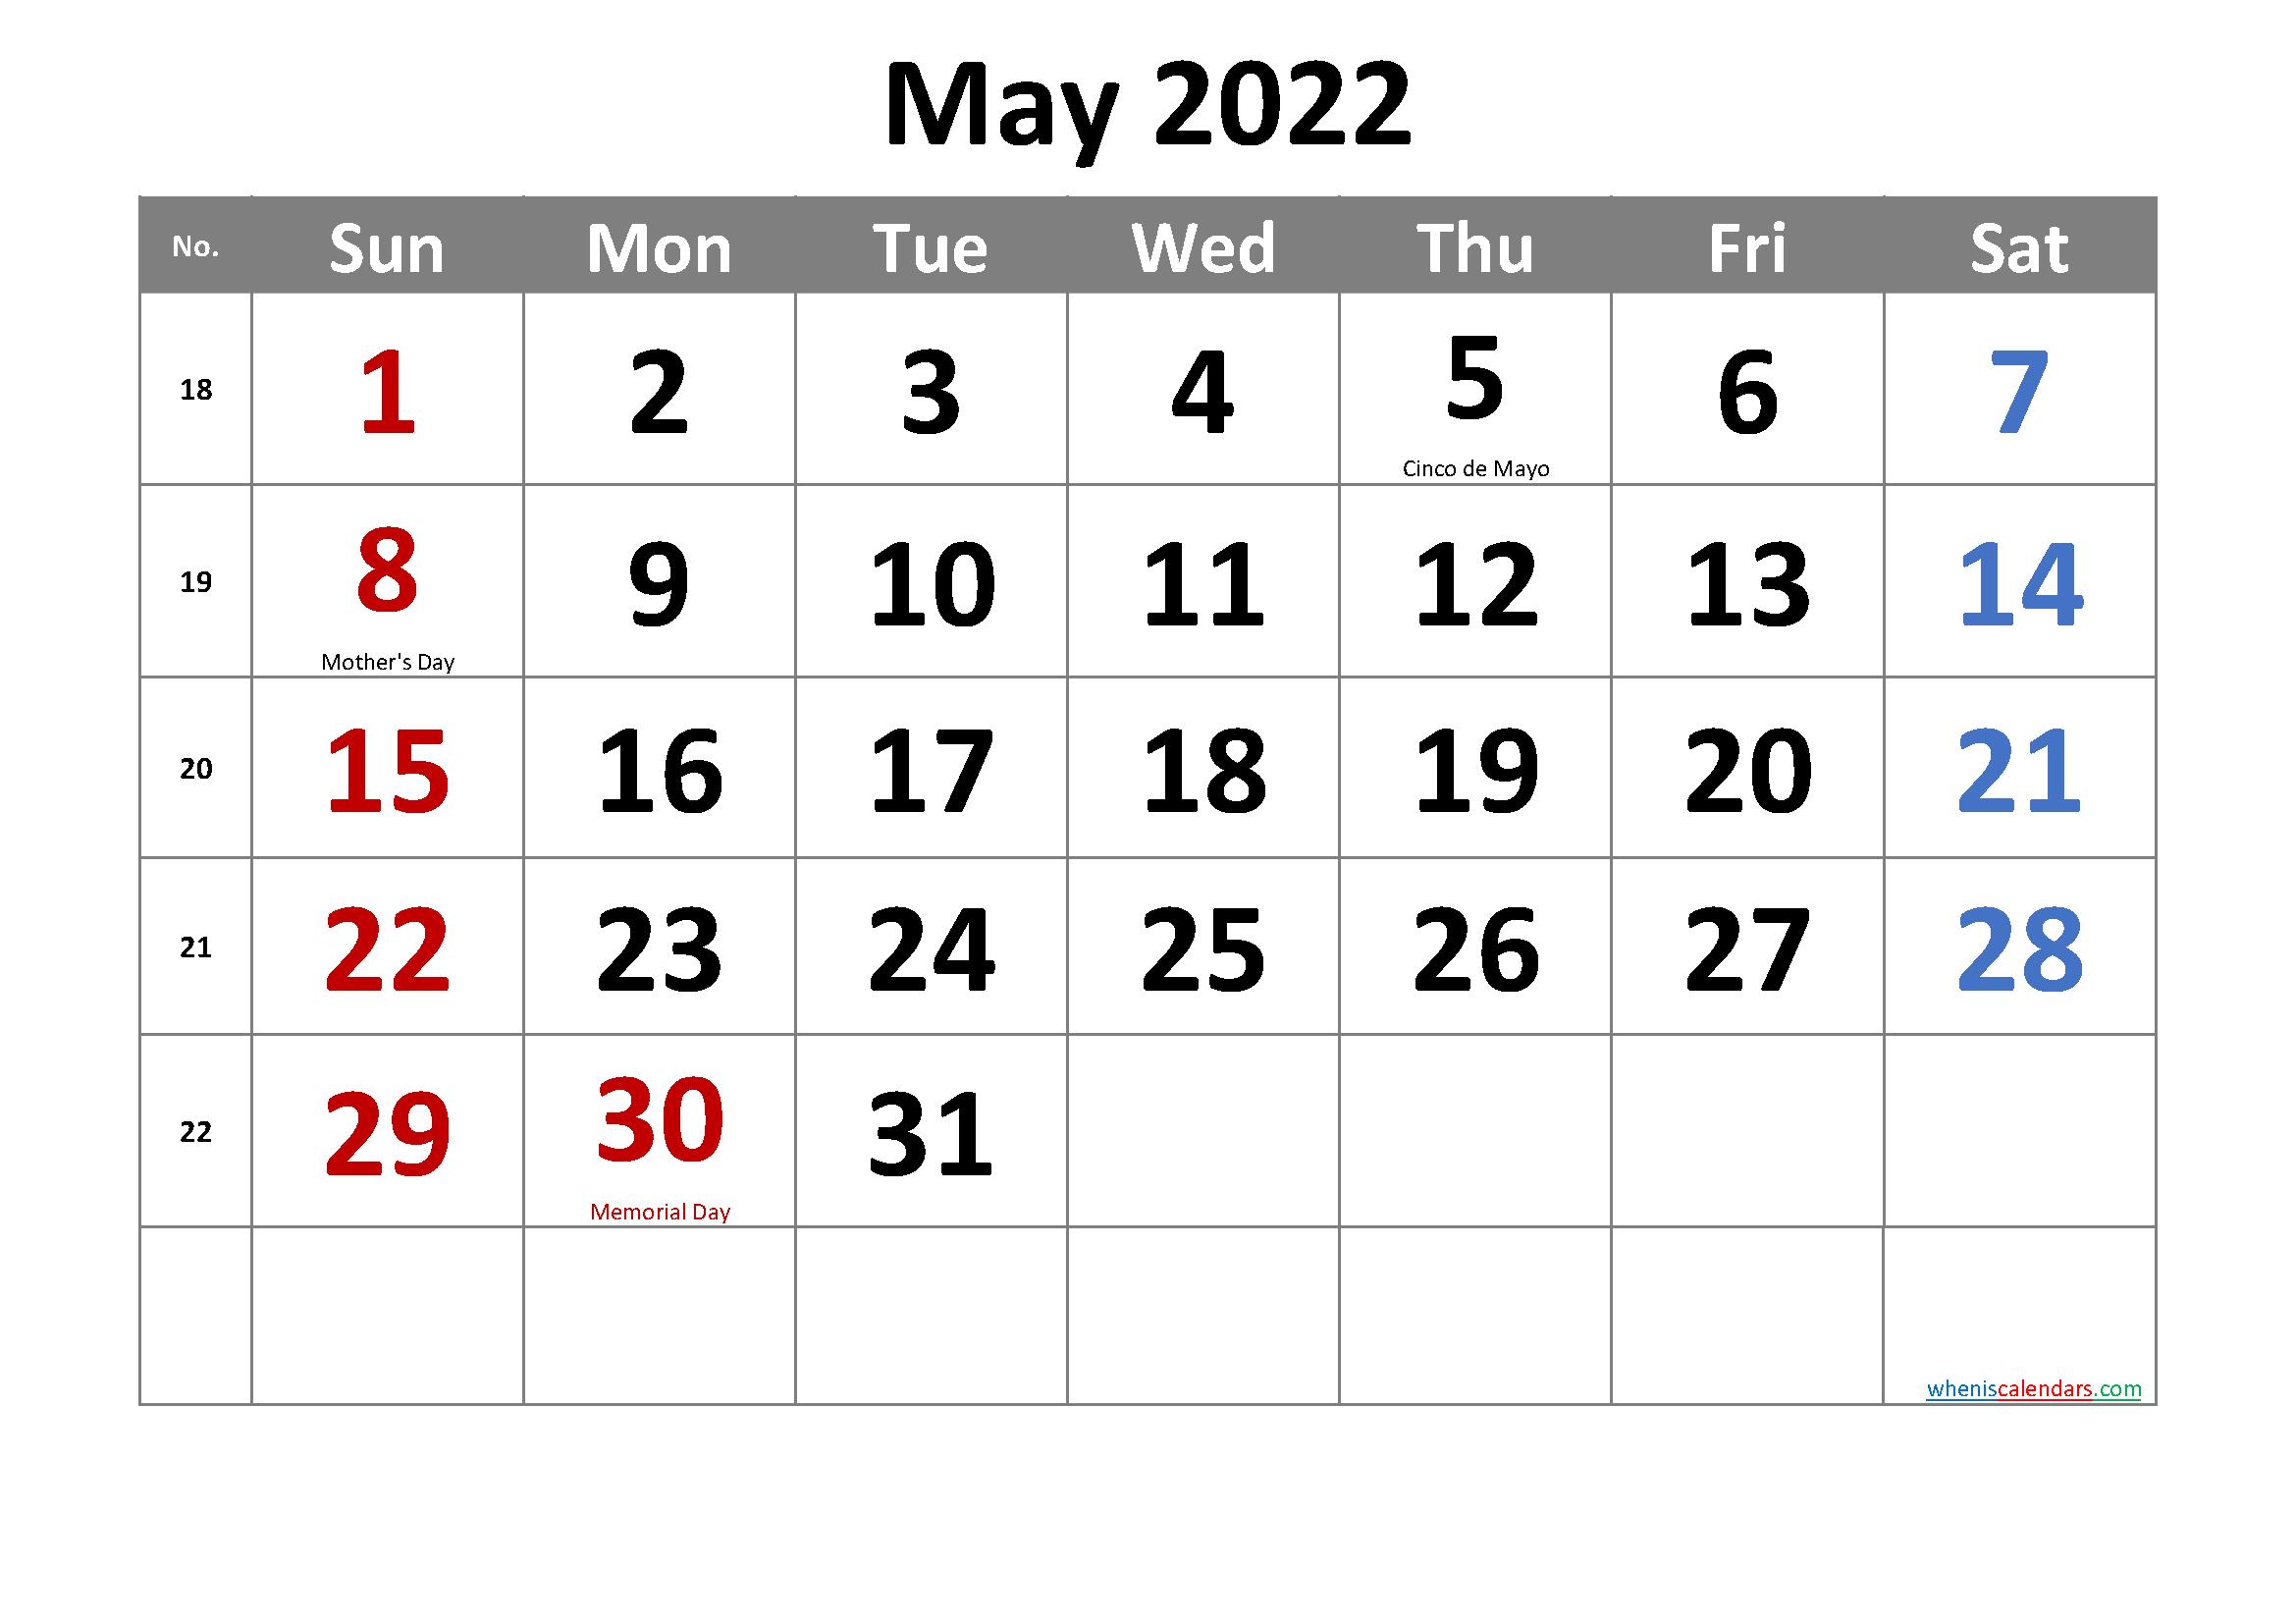 Free May 2022 Calendar Printable in Printable Calendar May 2022